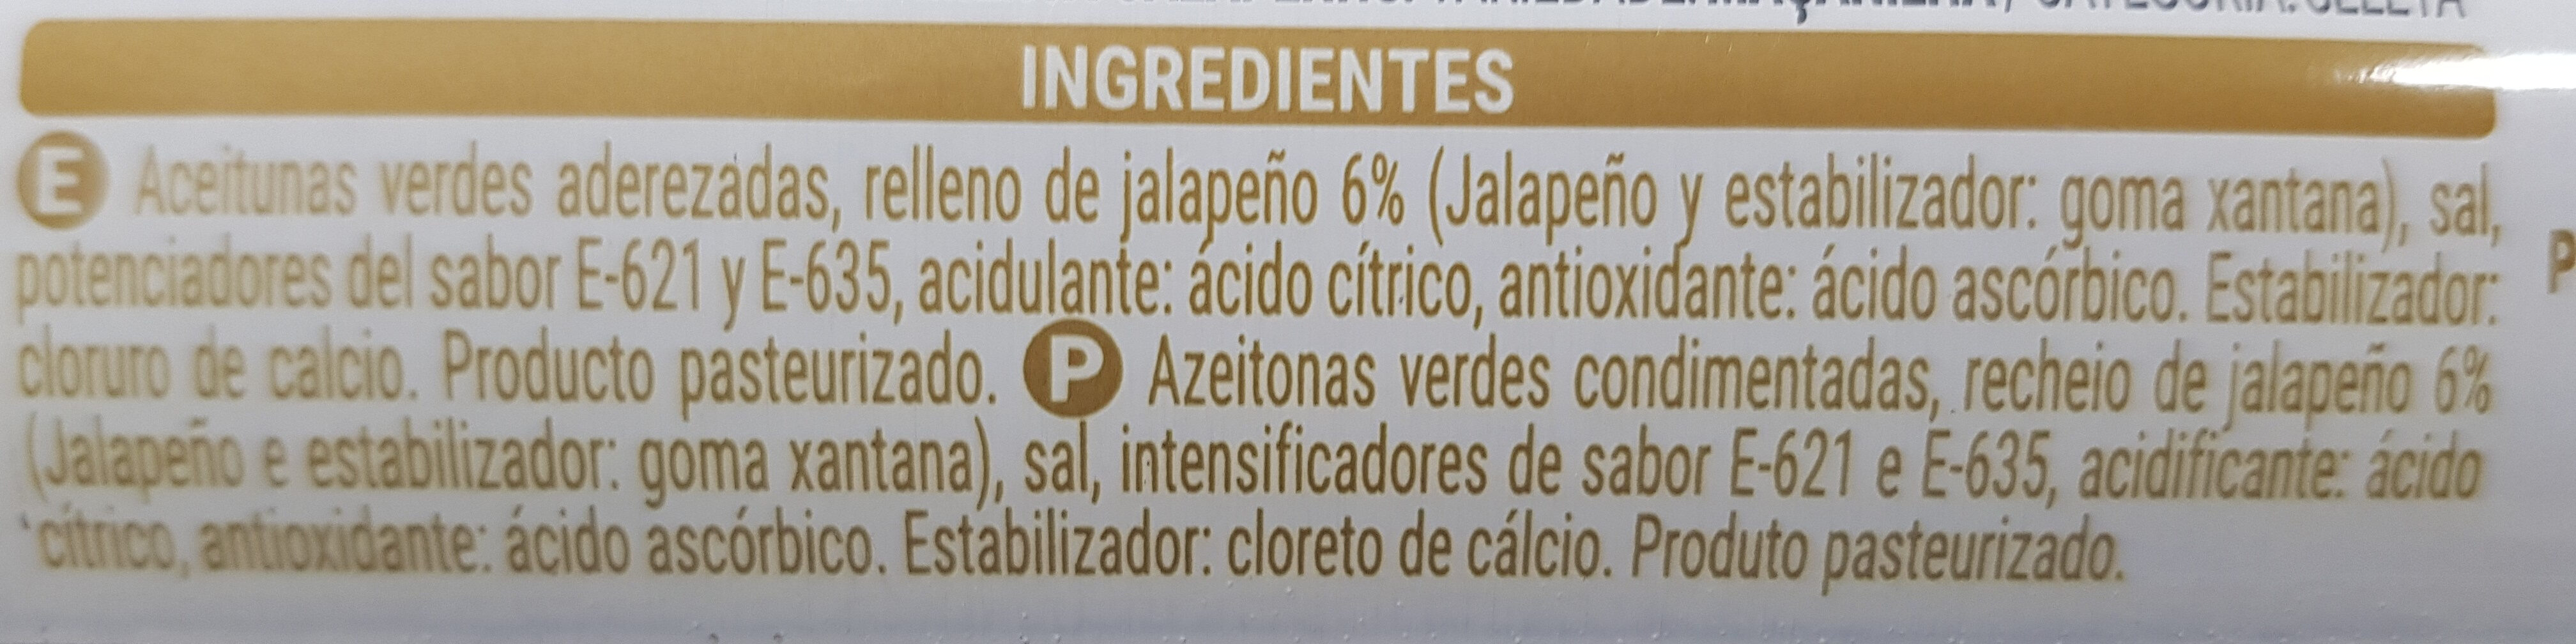 Aceitunas Verdes Rellenas De Jalapeño - Ingredientes - es